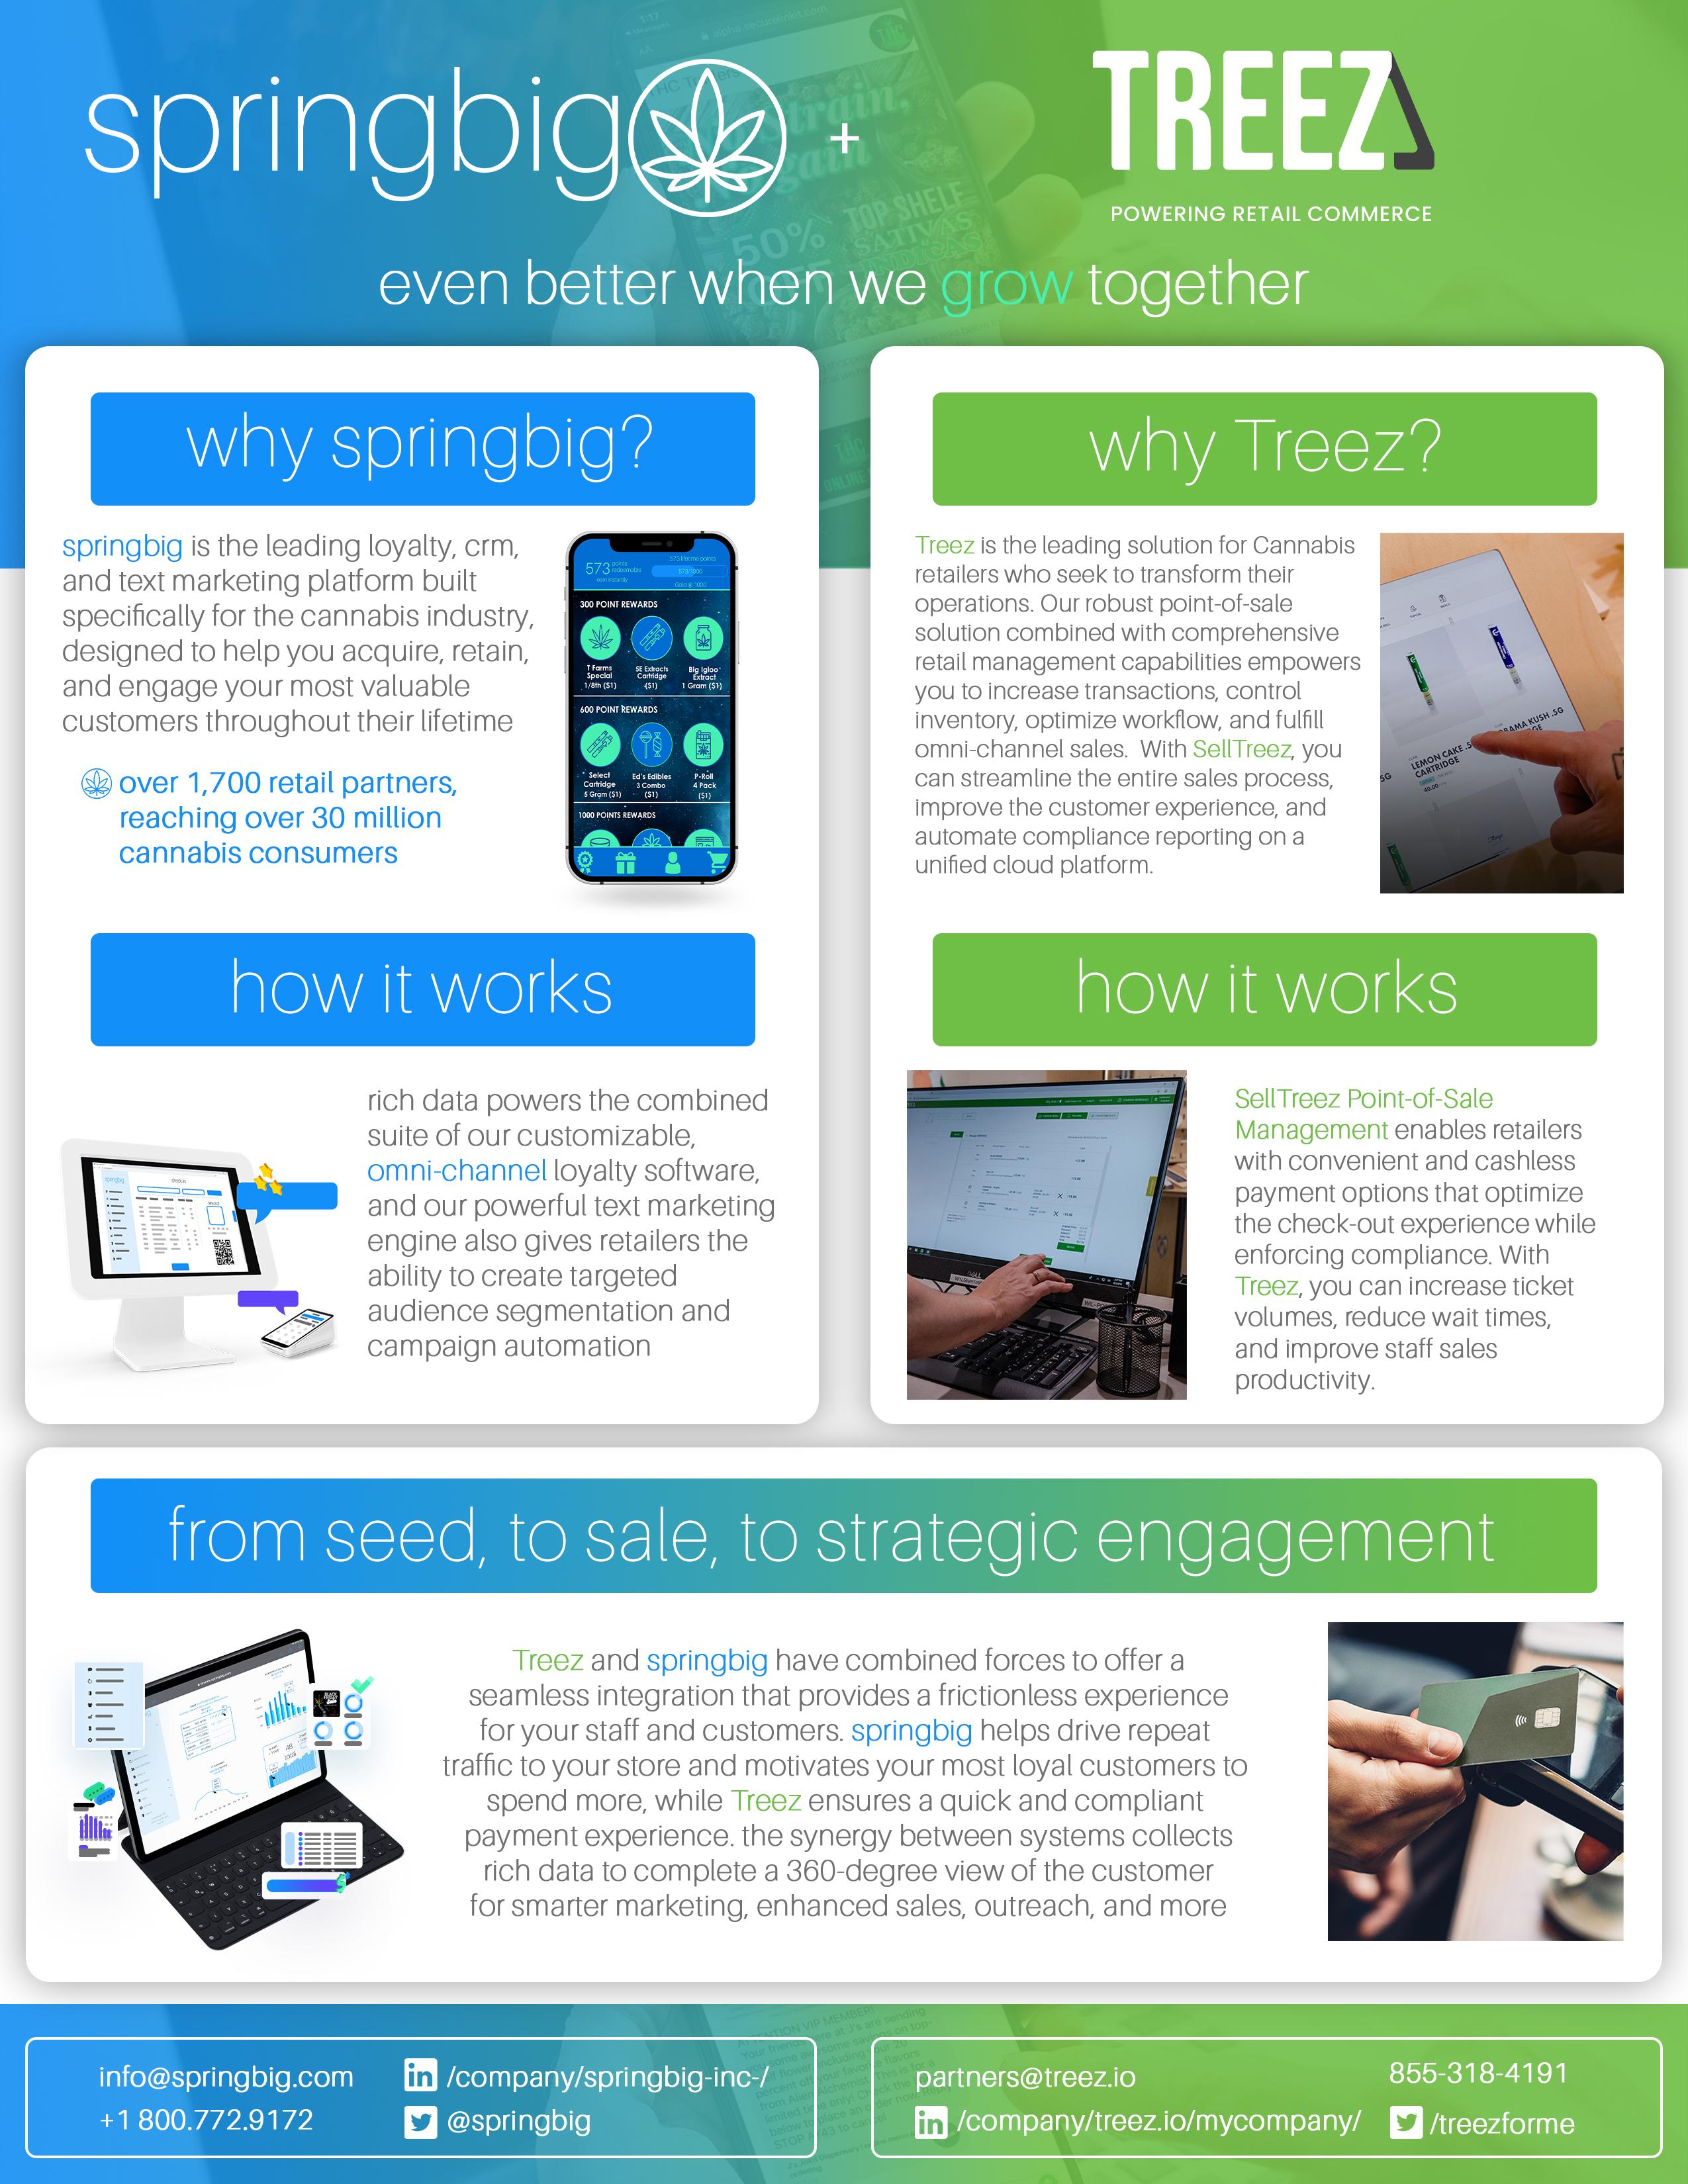 springbig's dispensary marketing software integration with Treez POS System